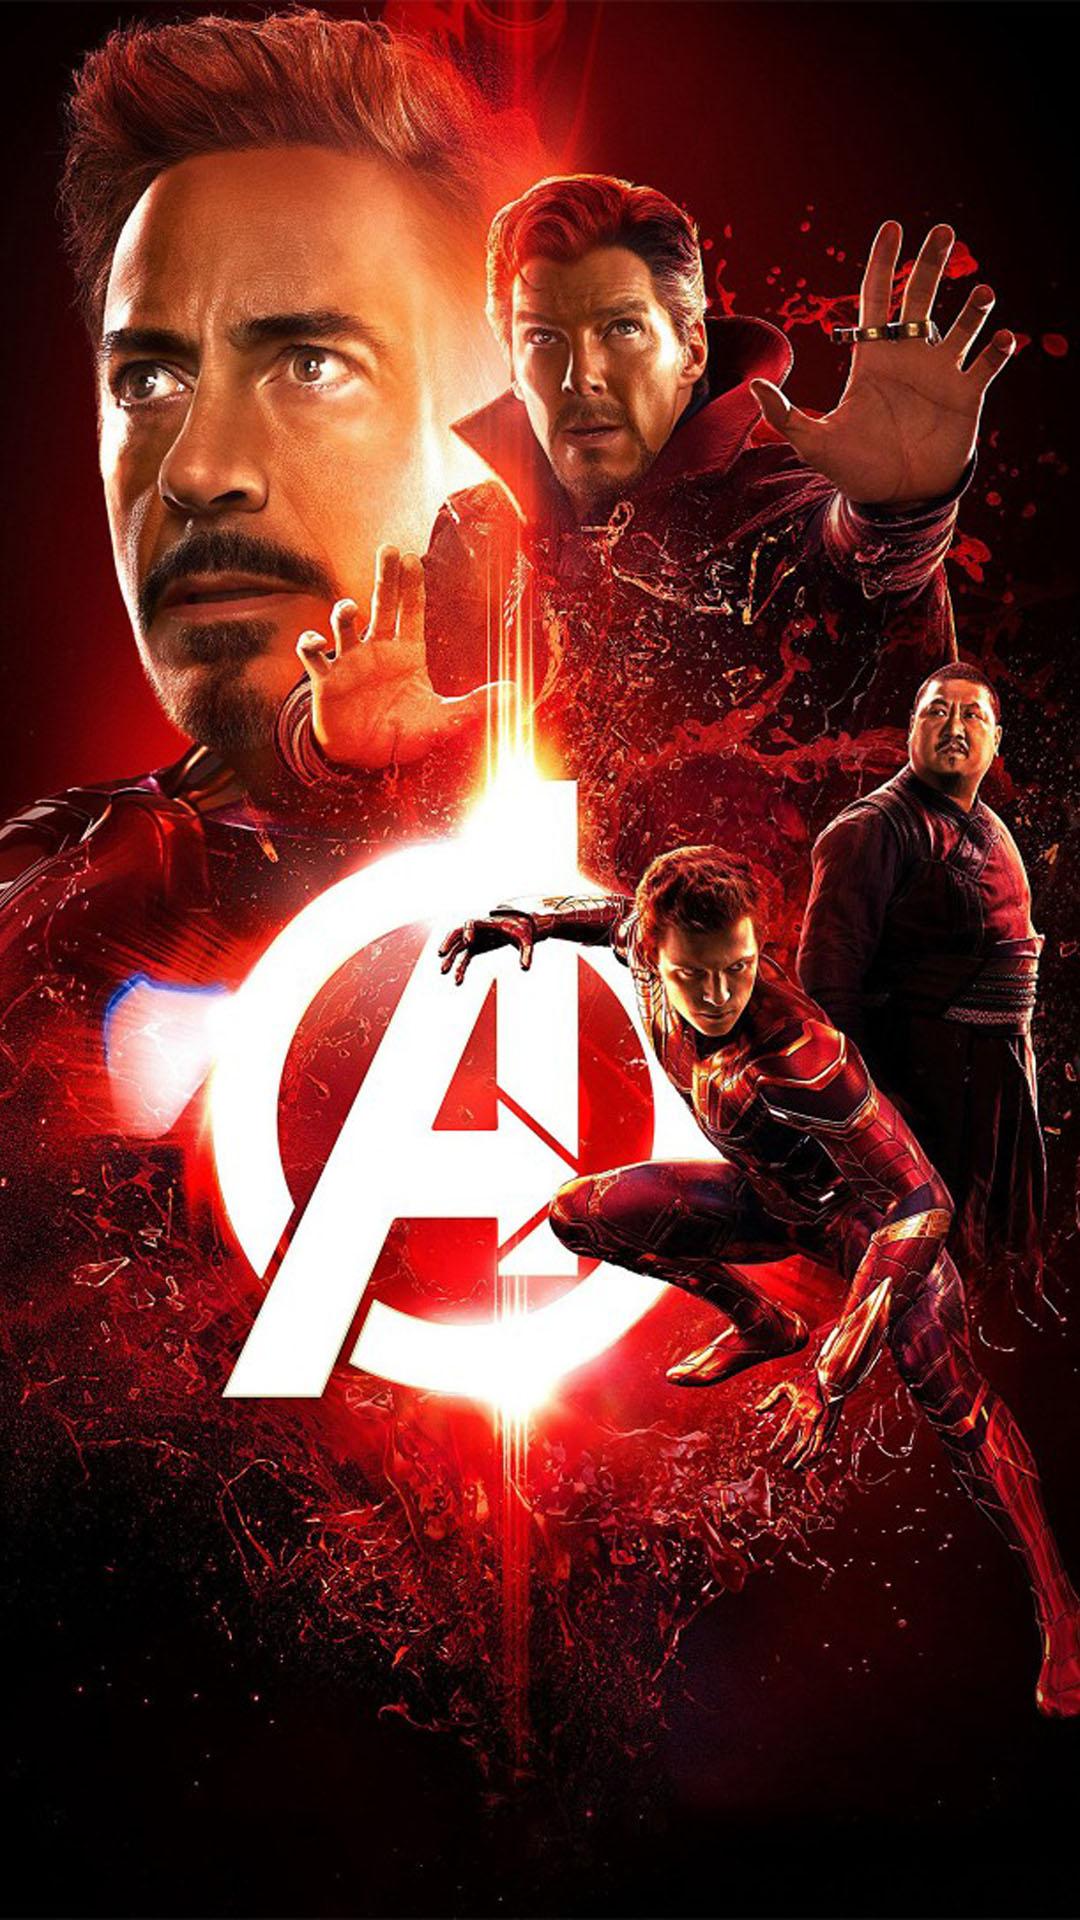 Download Avengers Infinity War 2018 Free Pure 4k Ultra Hd Mobile